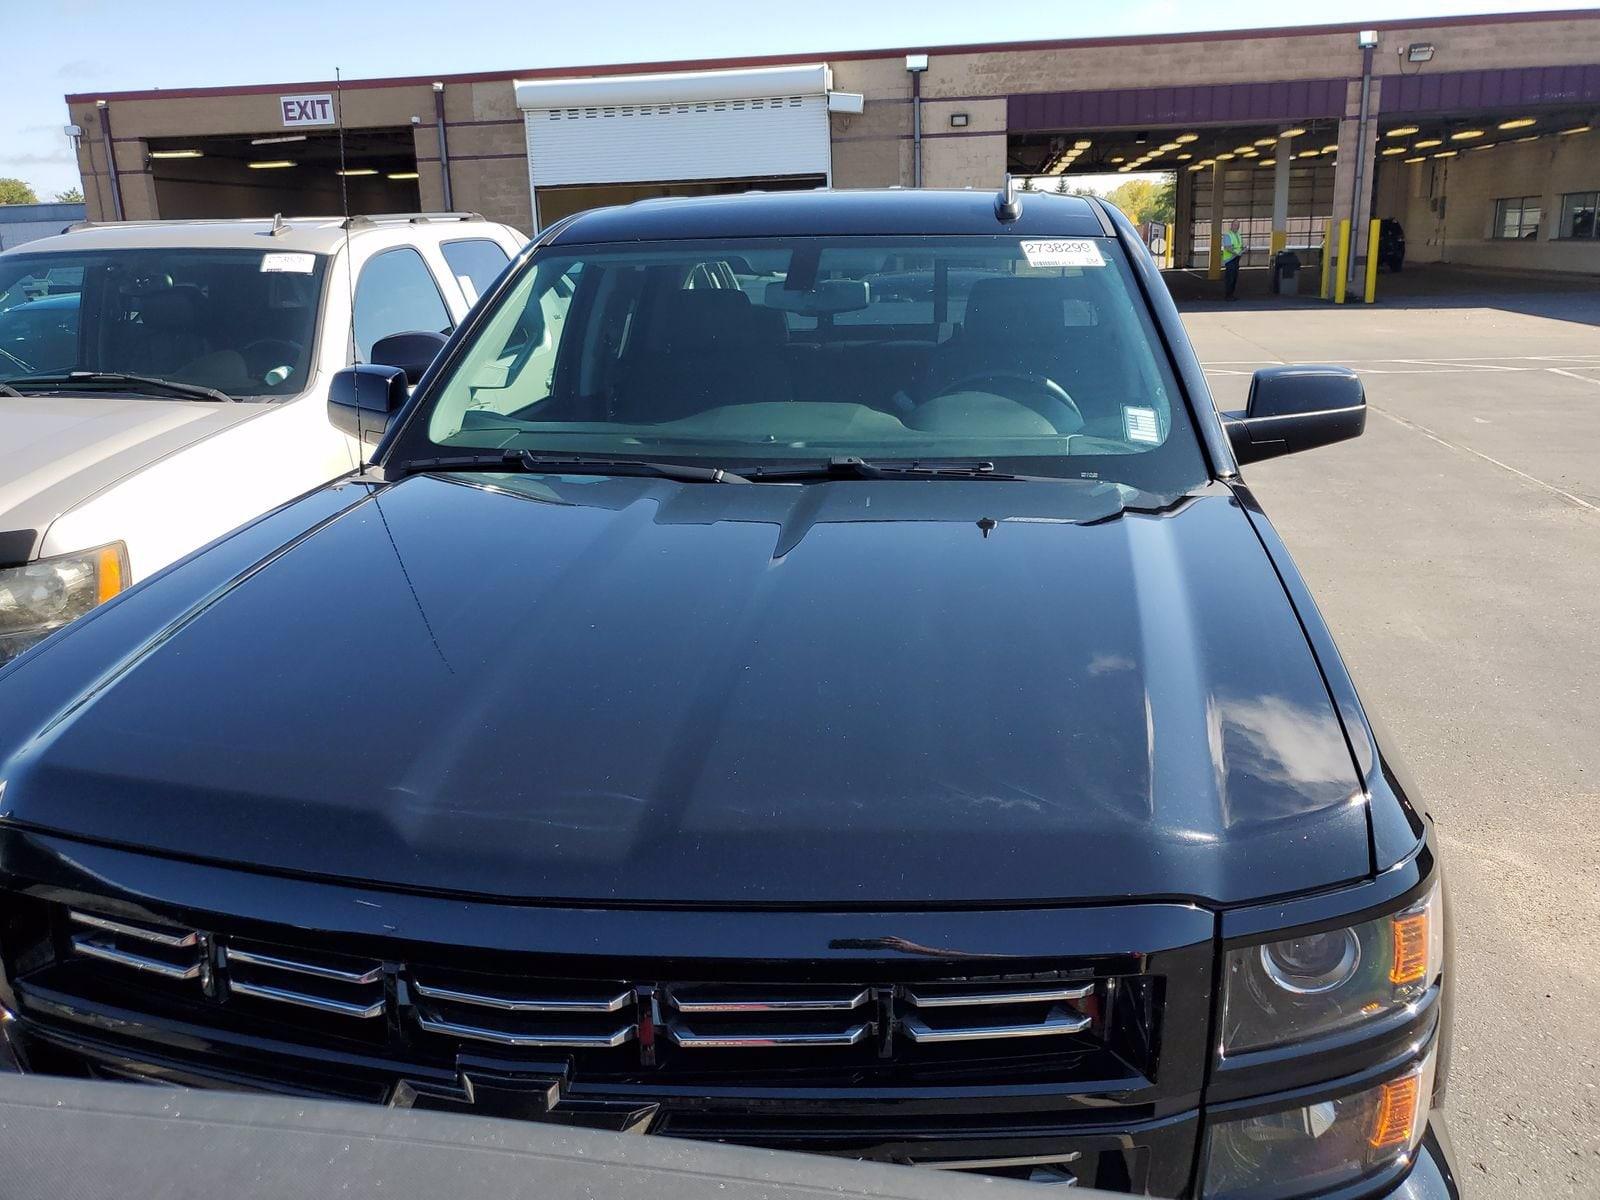 Used 2015 Chevrolet Silverado 1500 LT with VIN 1GCVKREC0FZ373986 for sale in Saint Cloud, Minnesota